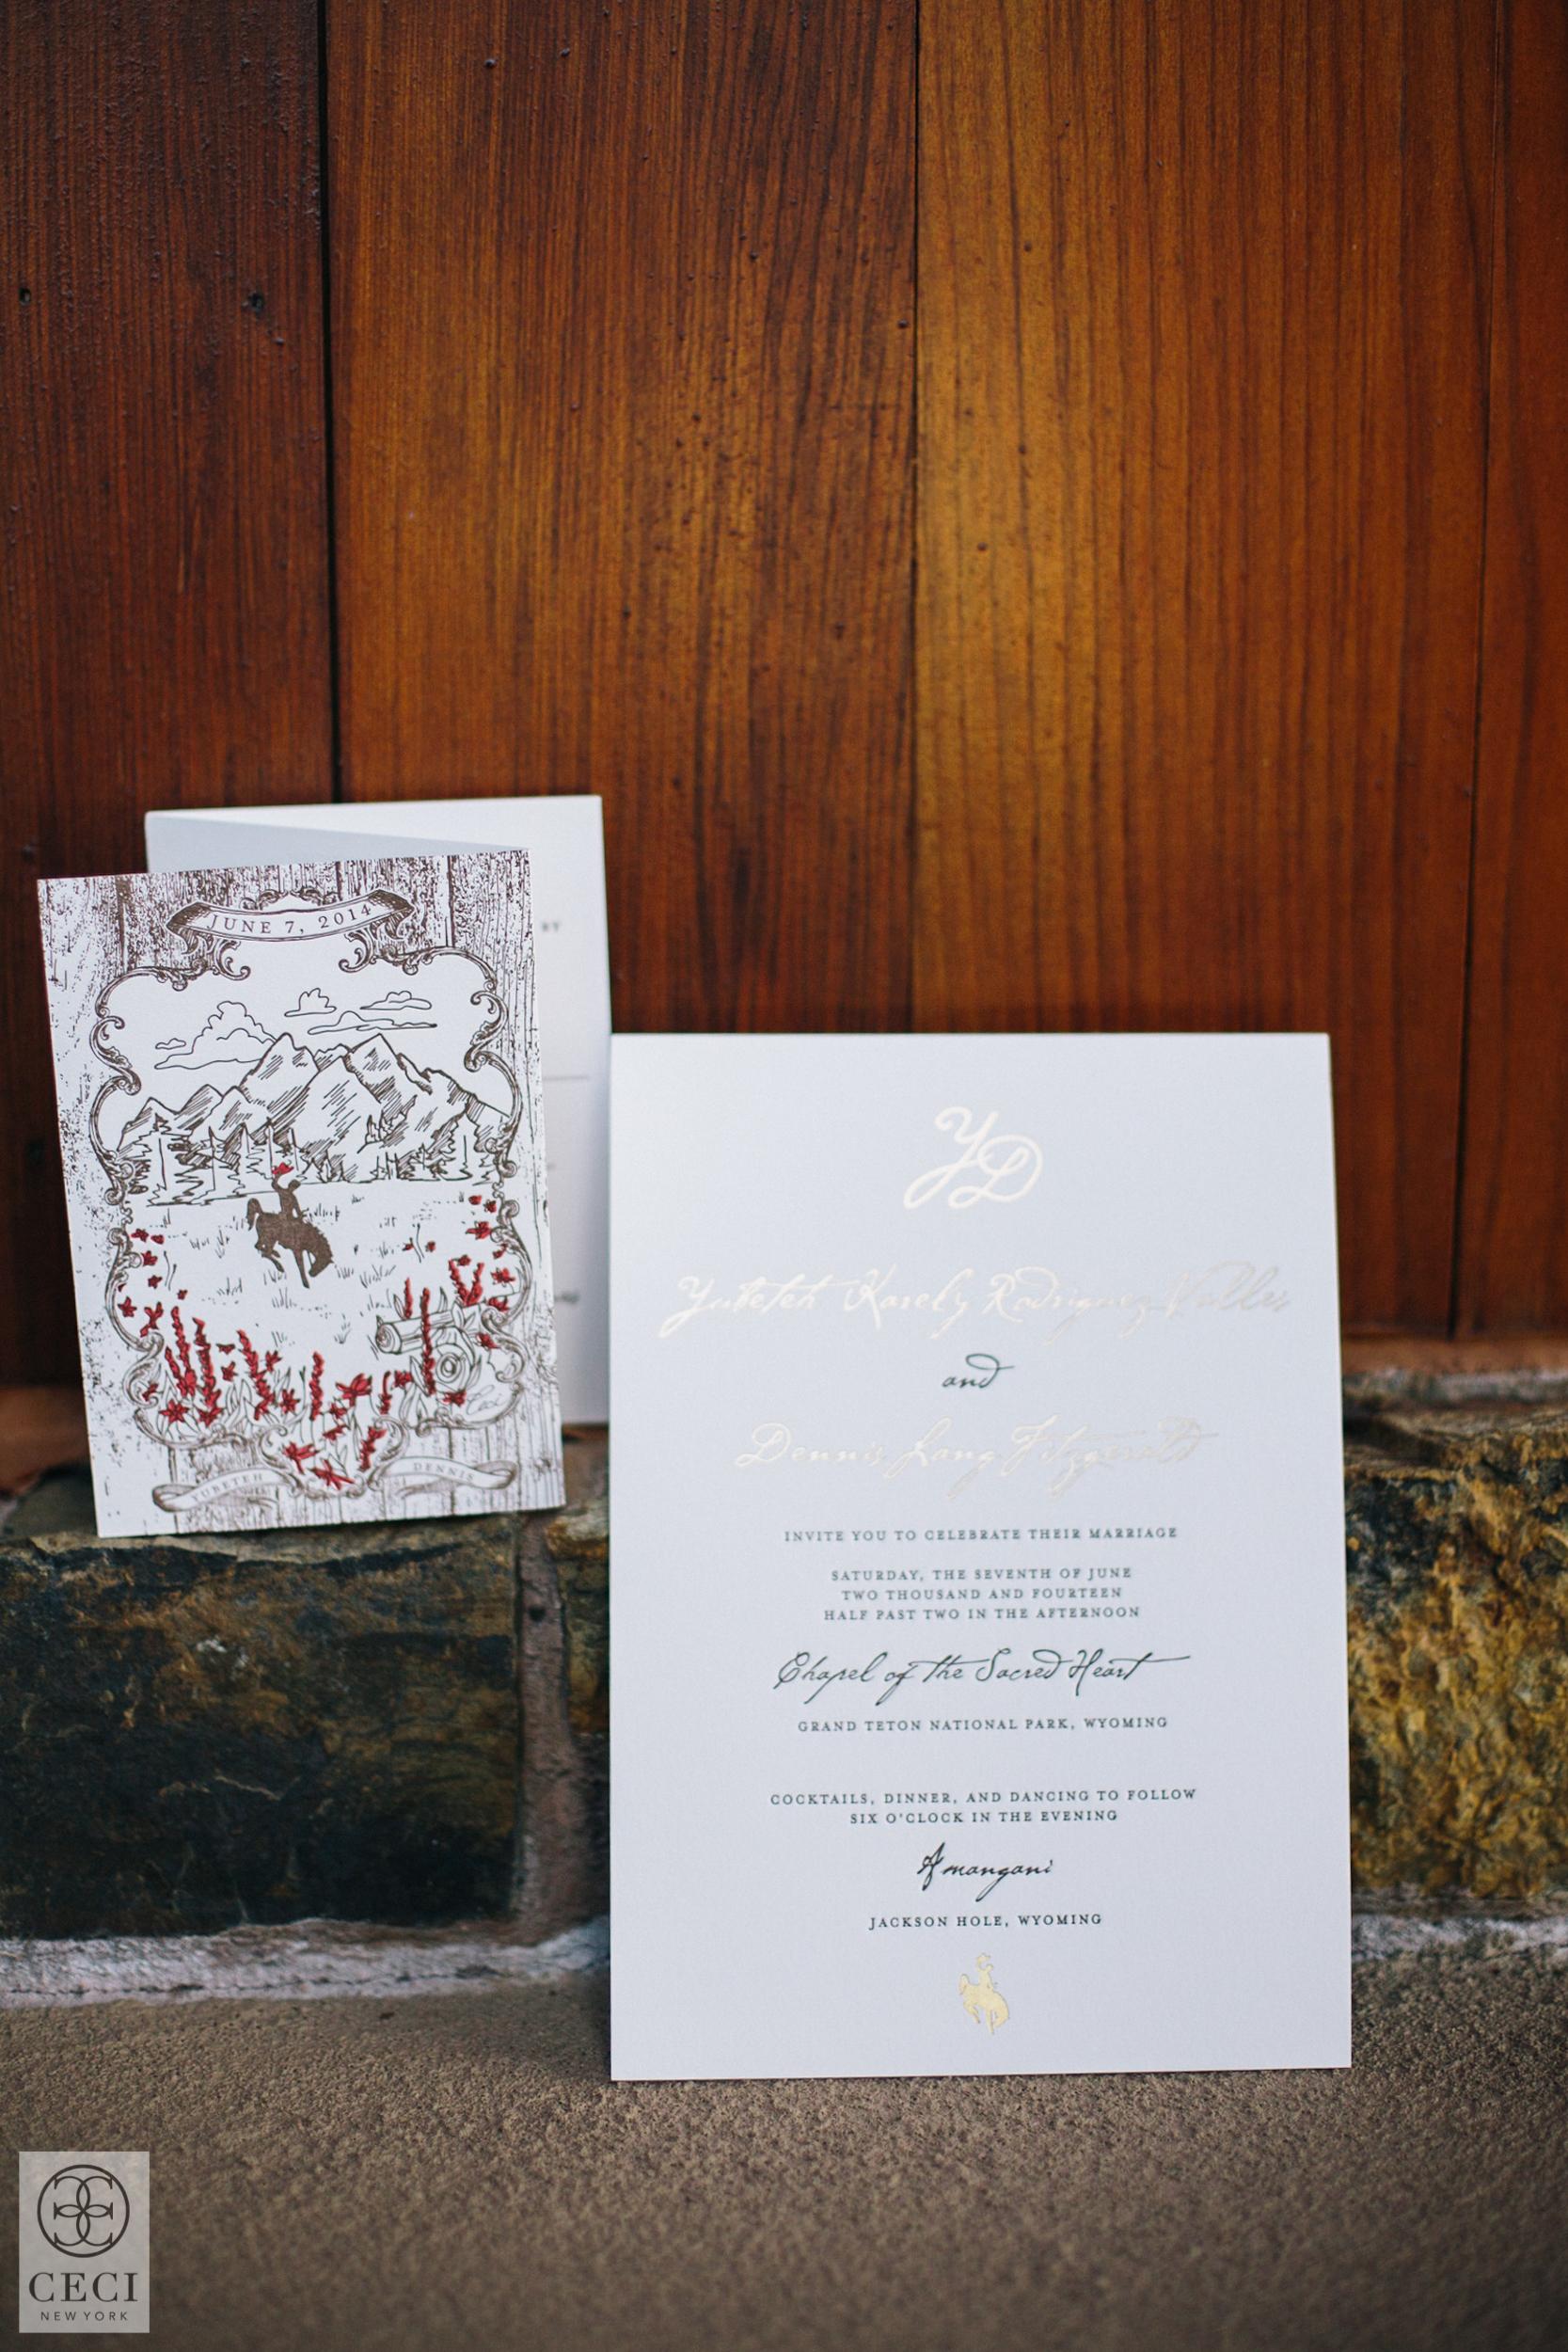 Ceci_New_York_Lyndsey_Hamilton_Events_Invitations_Wedding_Amangani_Elegance_Gold_Foil_Letterpress_Classic_Stamping_Custom_Couture_Personalized.jpg